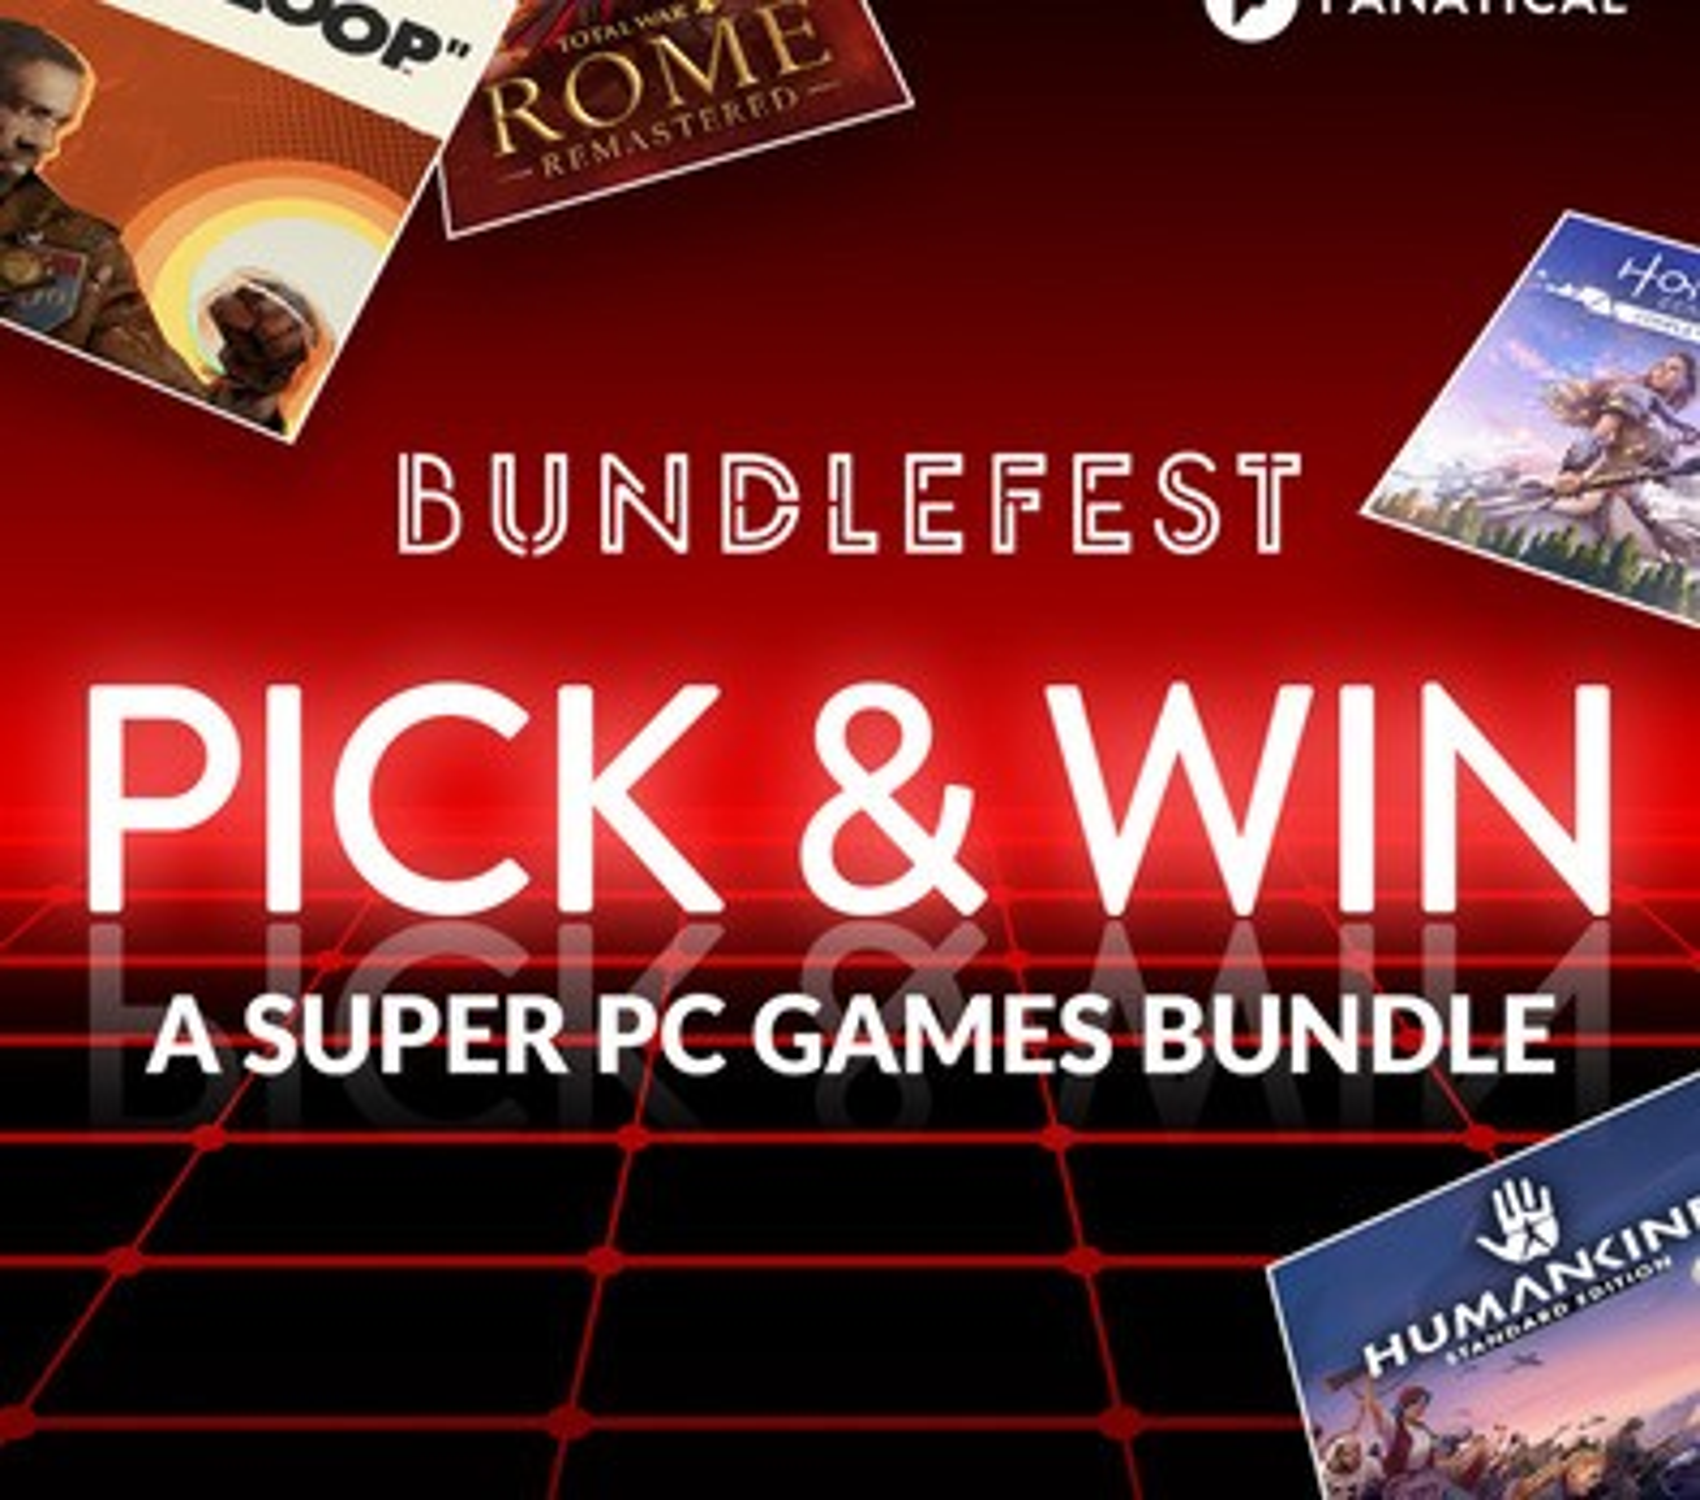 Win 1 of 3 Super PC Game Bundles